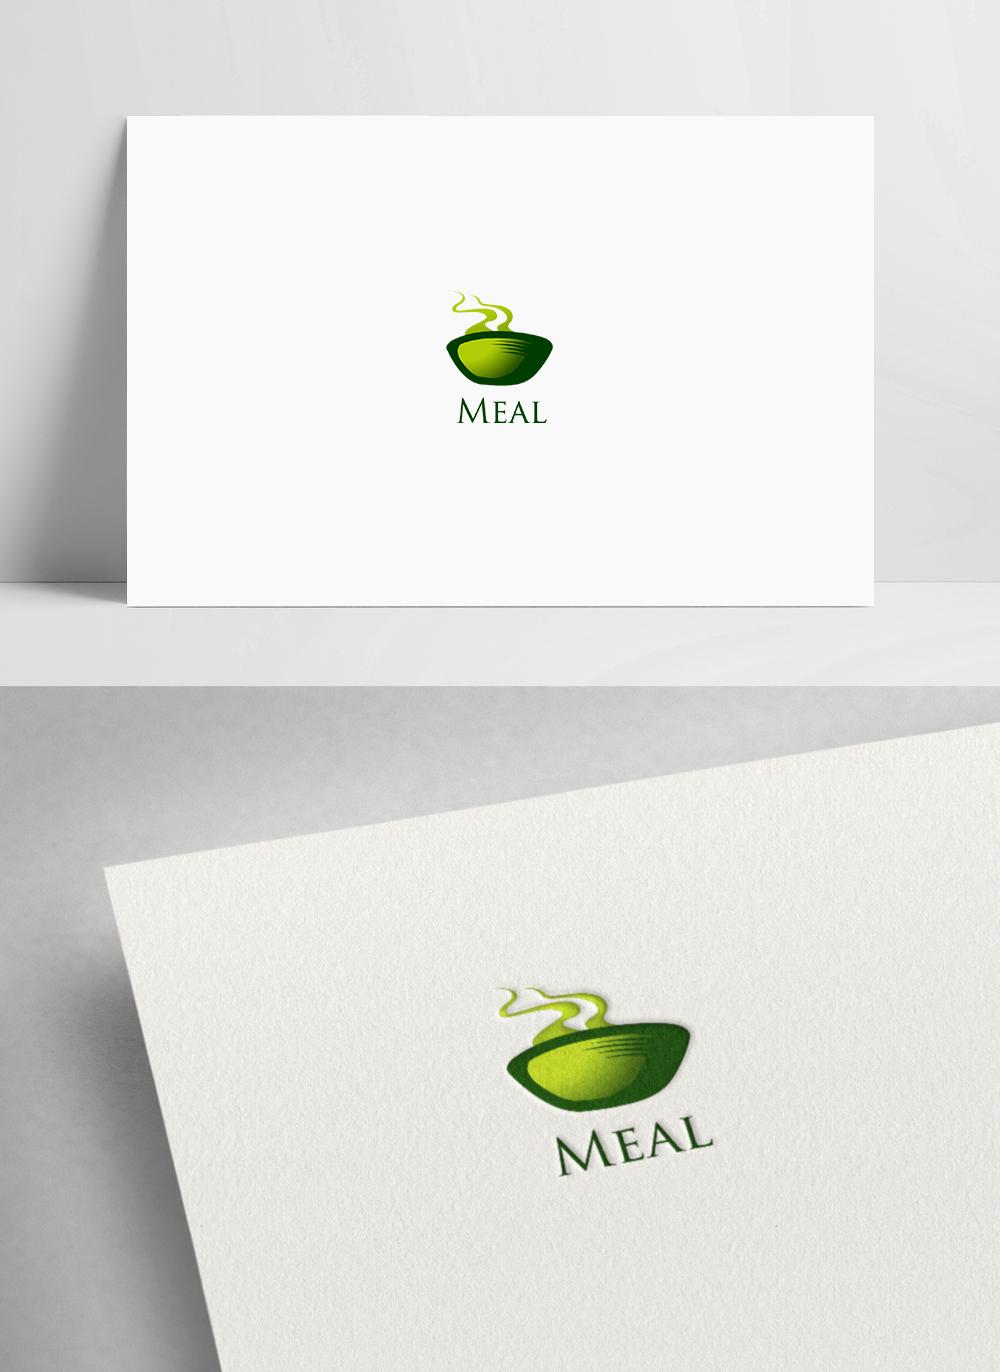 Gambar Logo Makanan : gambar, makanan, Makanan, Inovatif, Gambar, Unduh, Gratis_imej, 450014099_Format, AI_my.lovepik.com